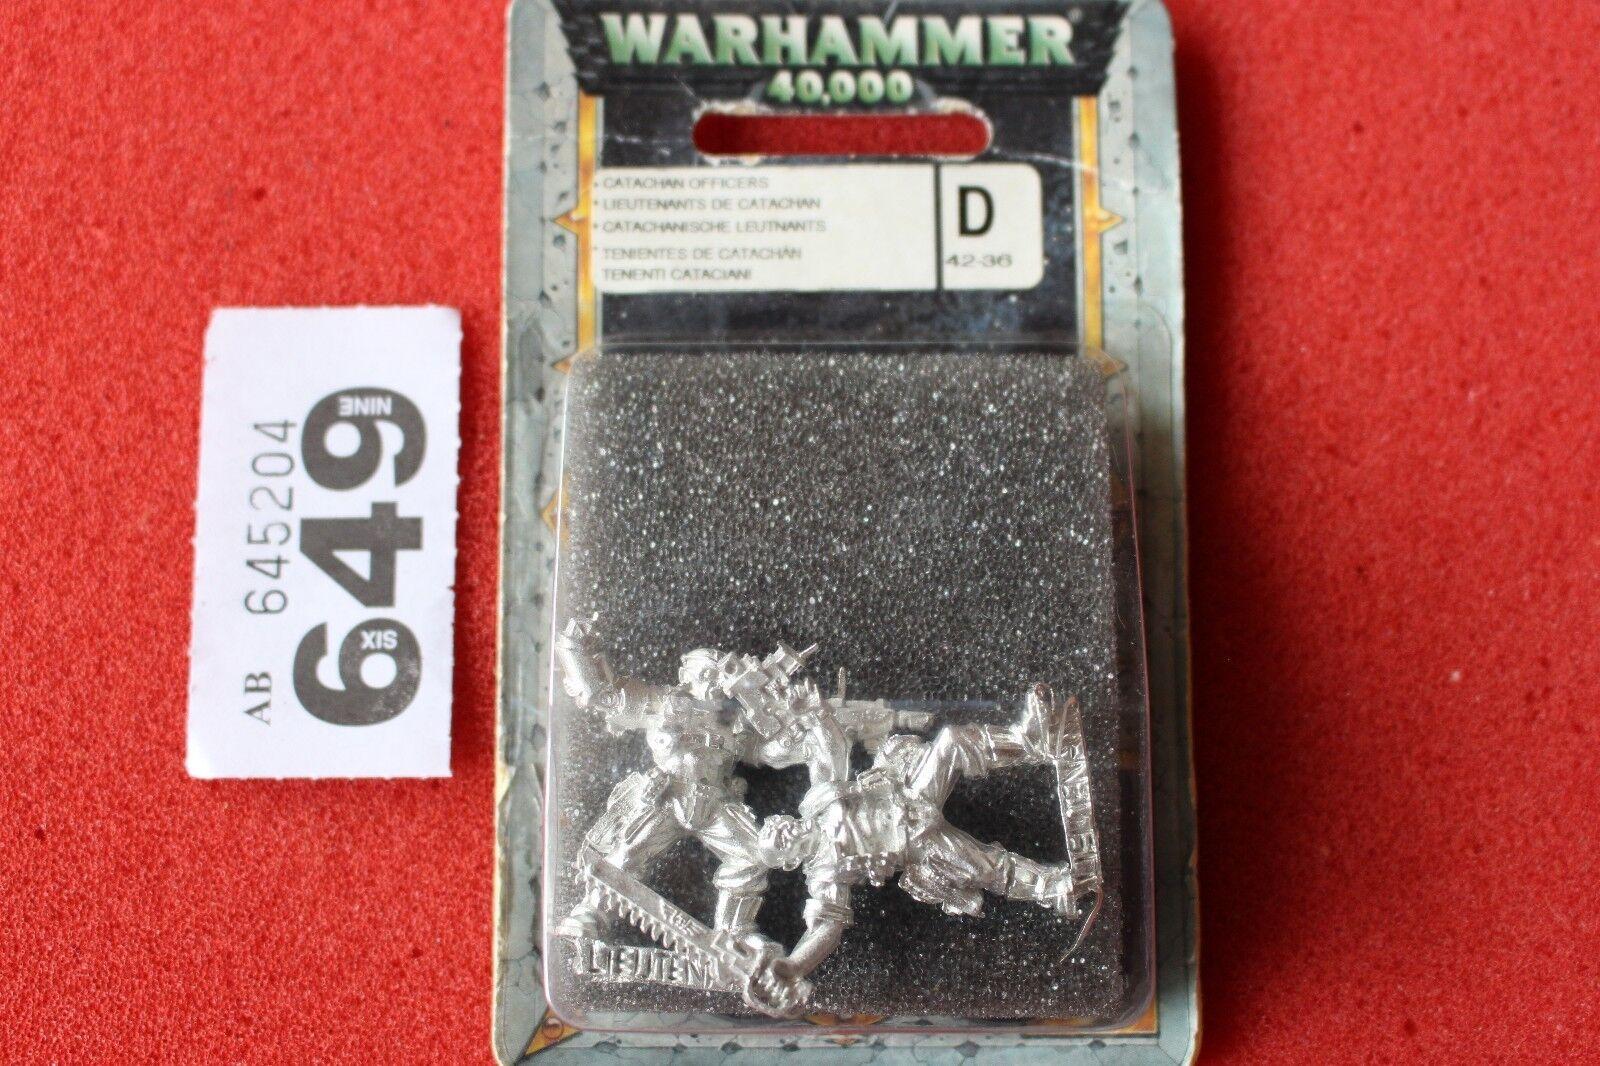 Games Workshop Warhammer 40k Catachan Officers Lieutenants Sergeants Metal New